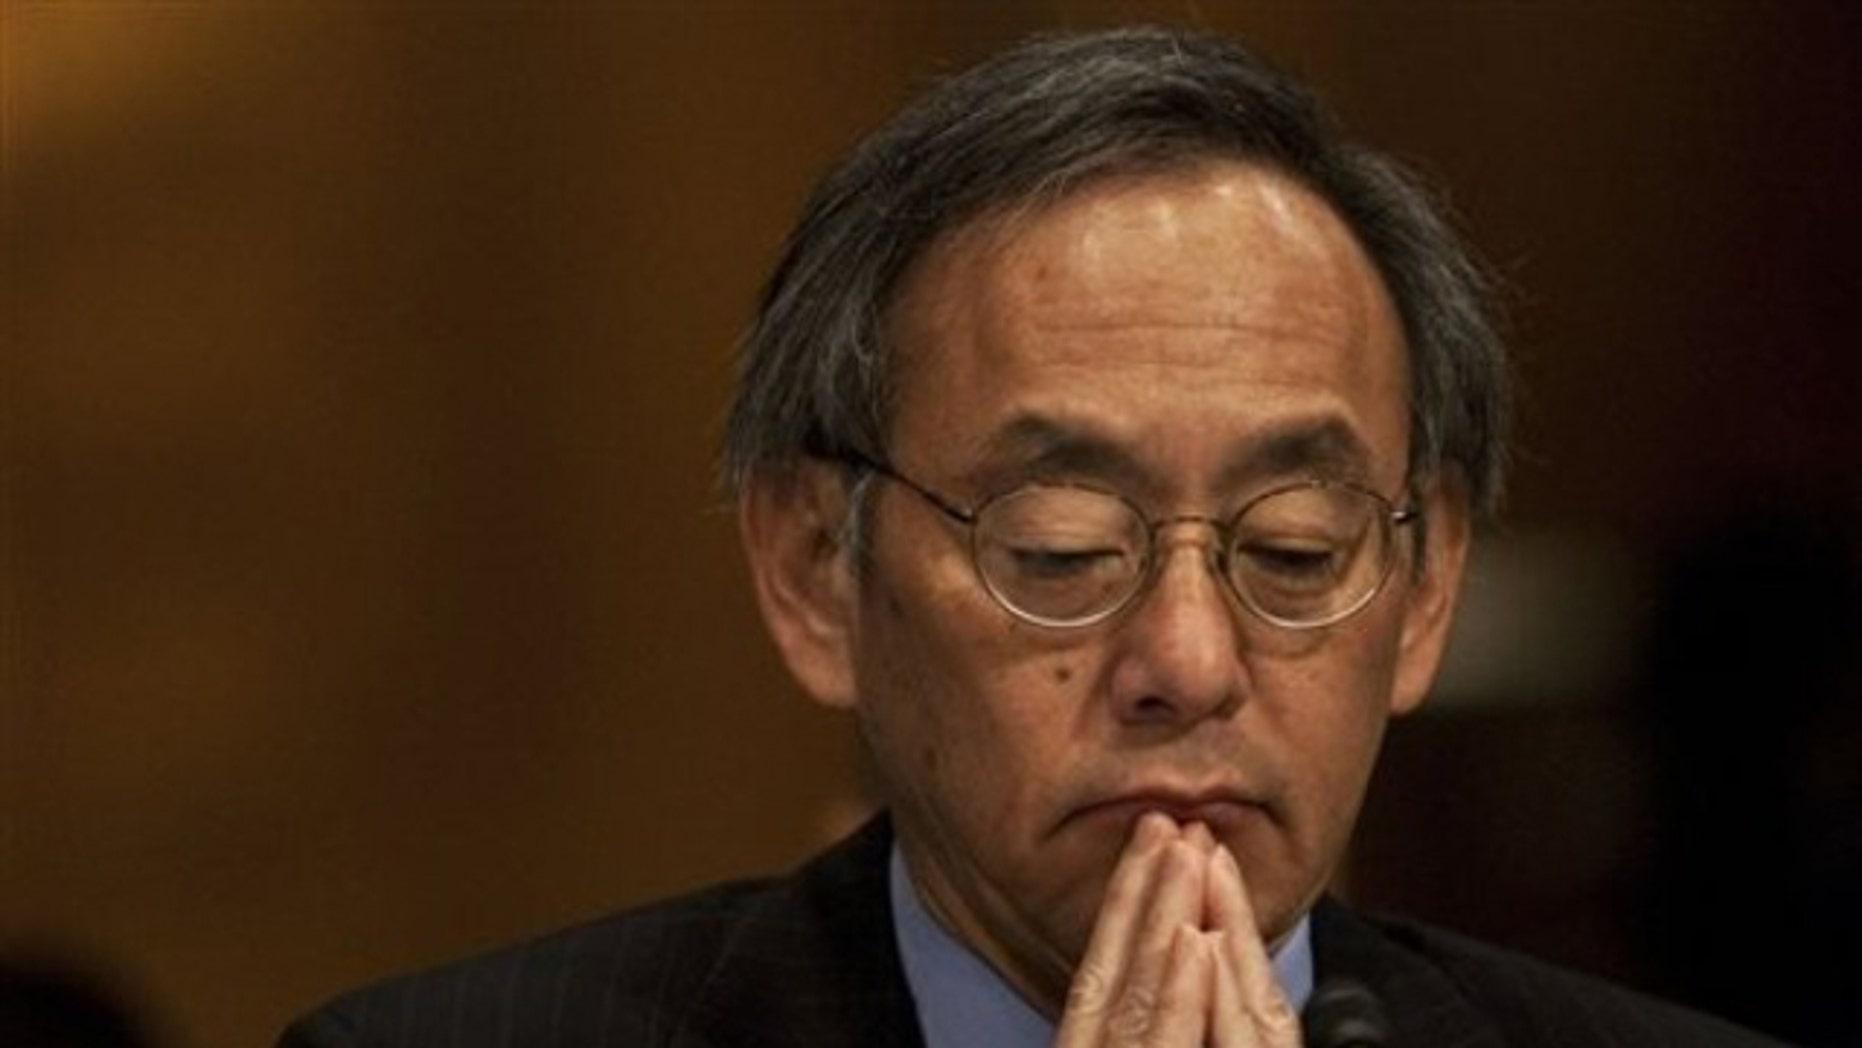 Energy Secretary Steven Chu pauses while testifying on Capitol Hill in Washington, Thursday, June 17, 2010. (AP)